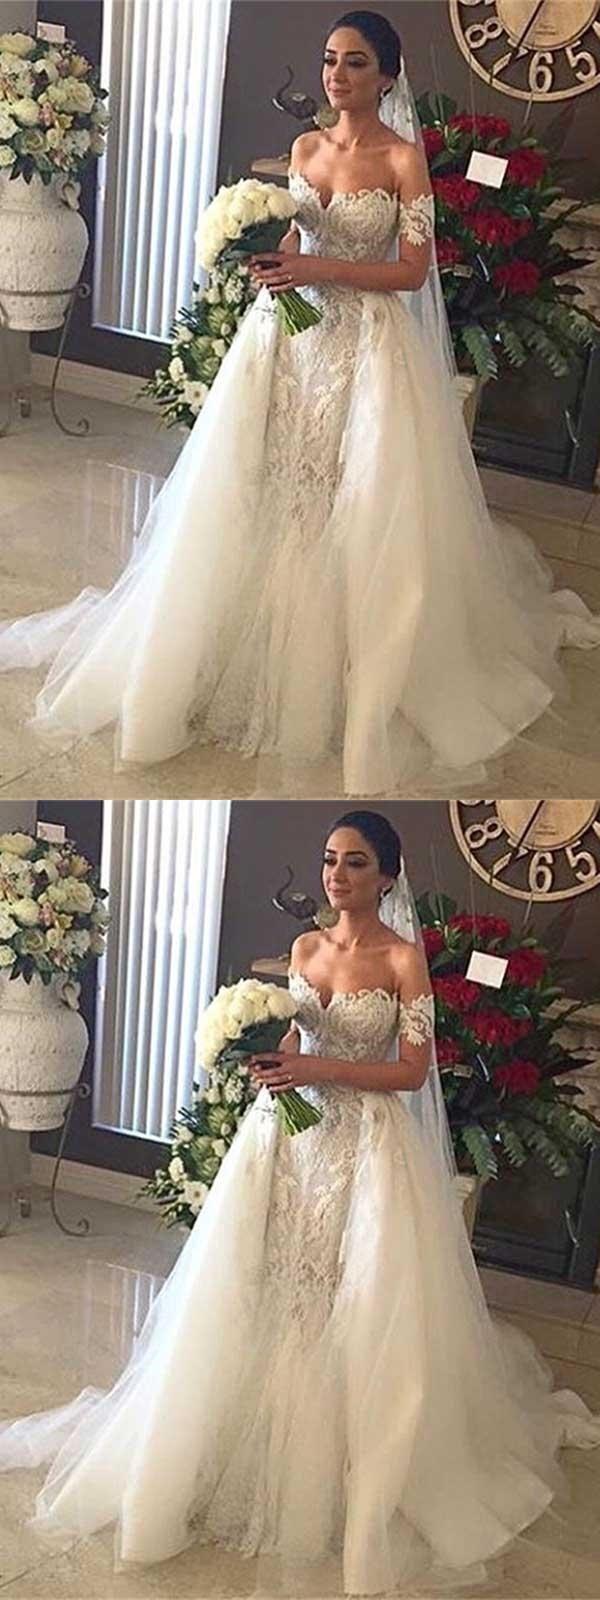 Princess Wedding Dress Offtheshoulder Detachable Train